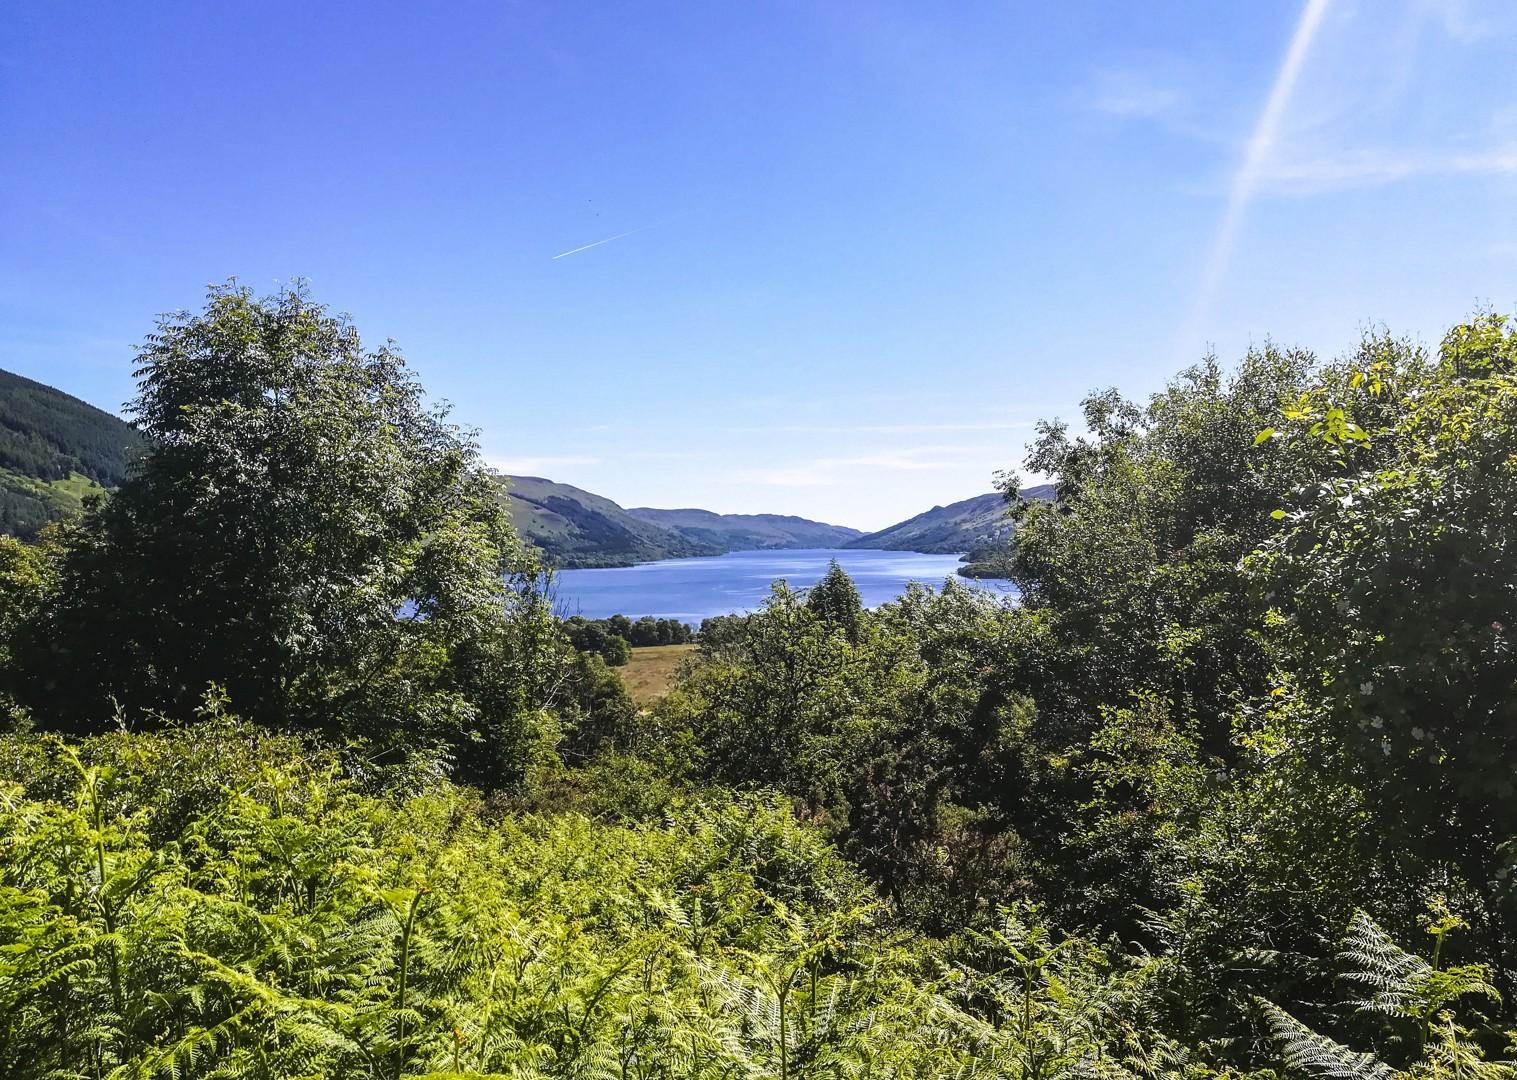 trossachs-scotland-uk-mountains-glens-lochs-fun-cycling-holiday.jpg - UK - Scotland - Lochs and Glens - Leisure Cycling